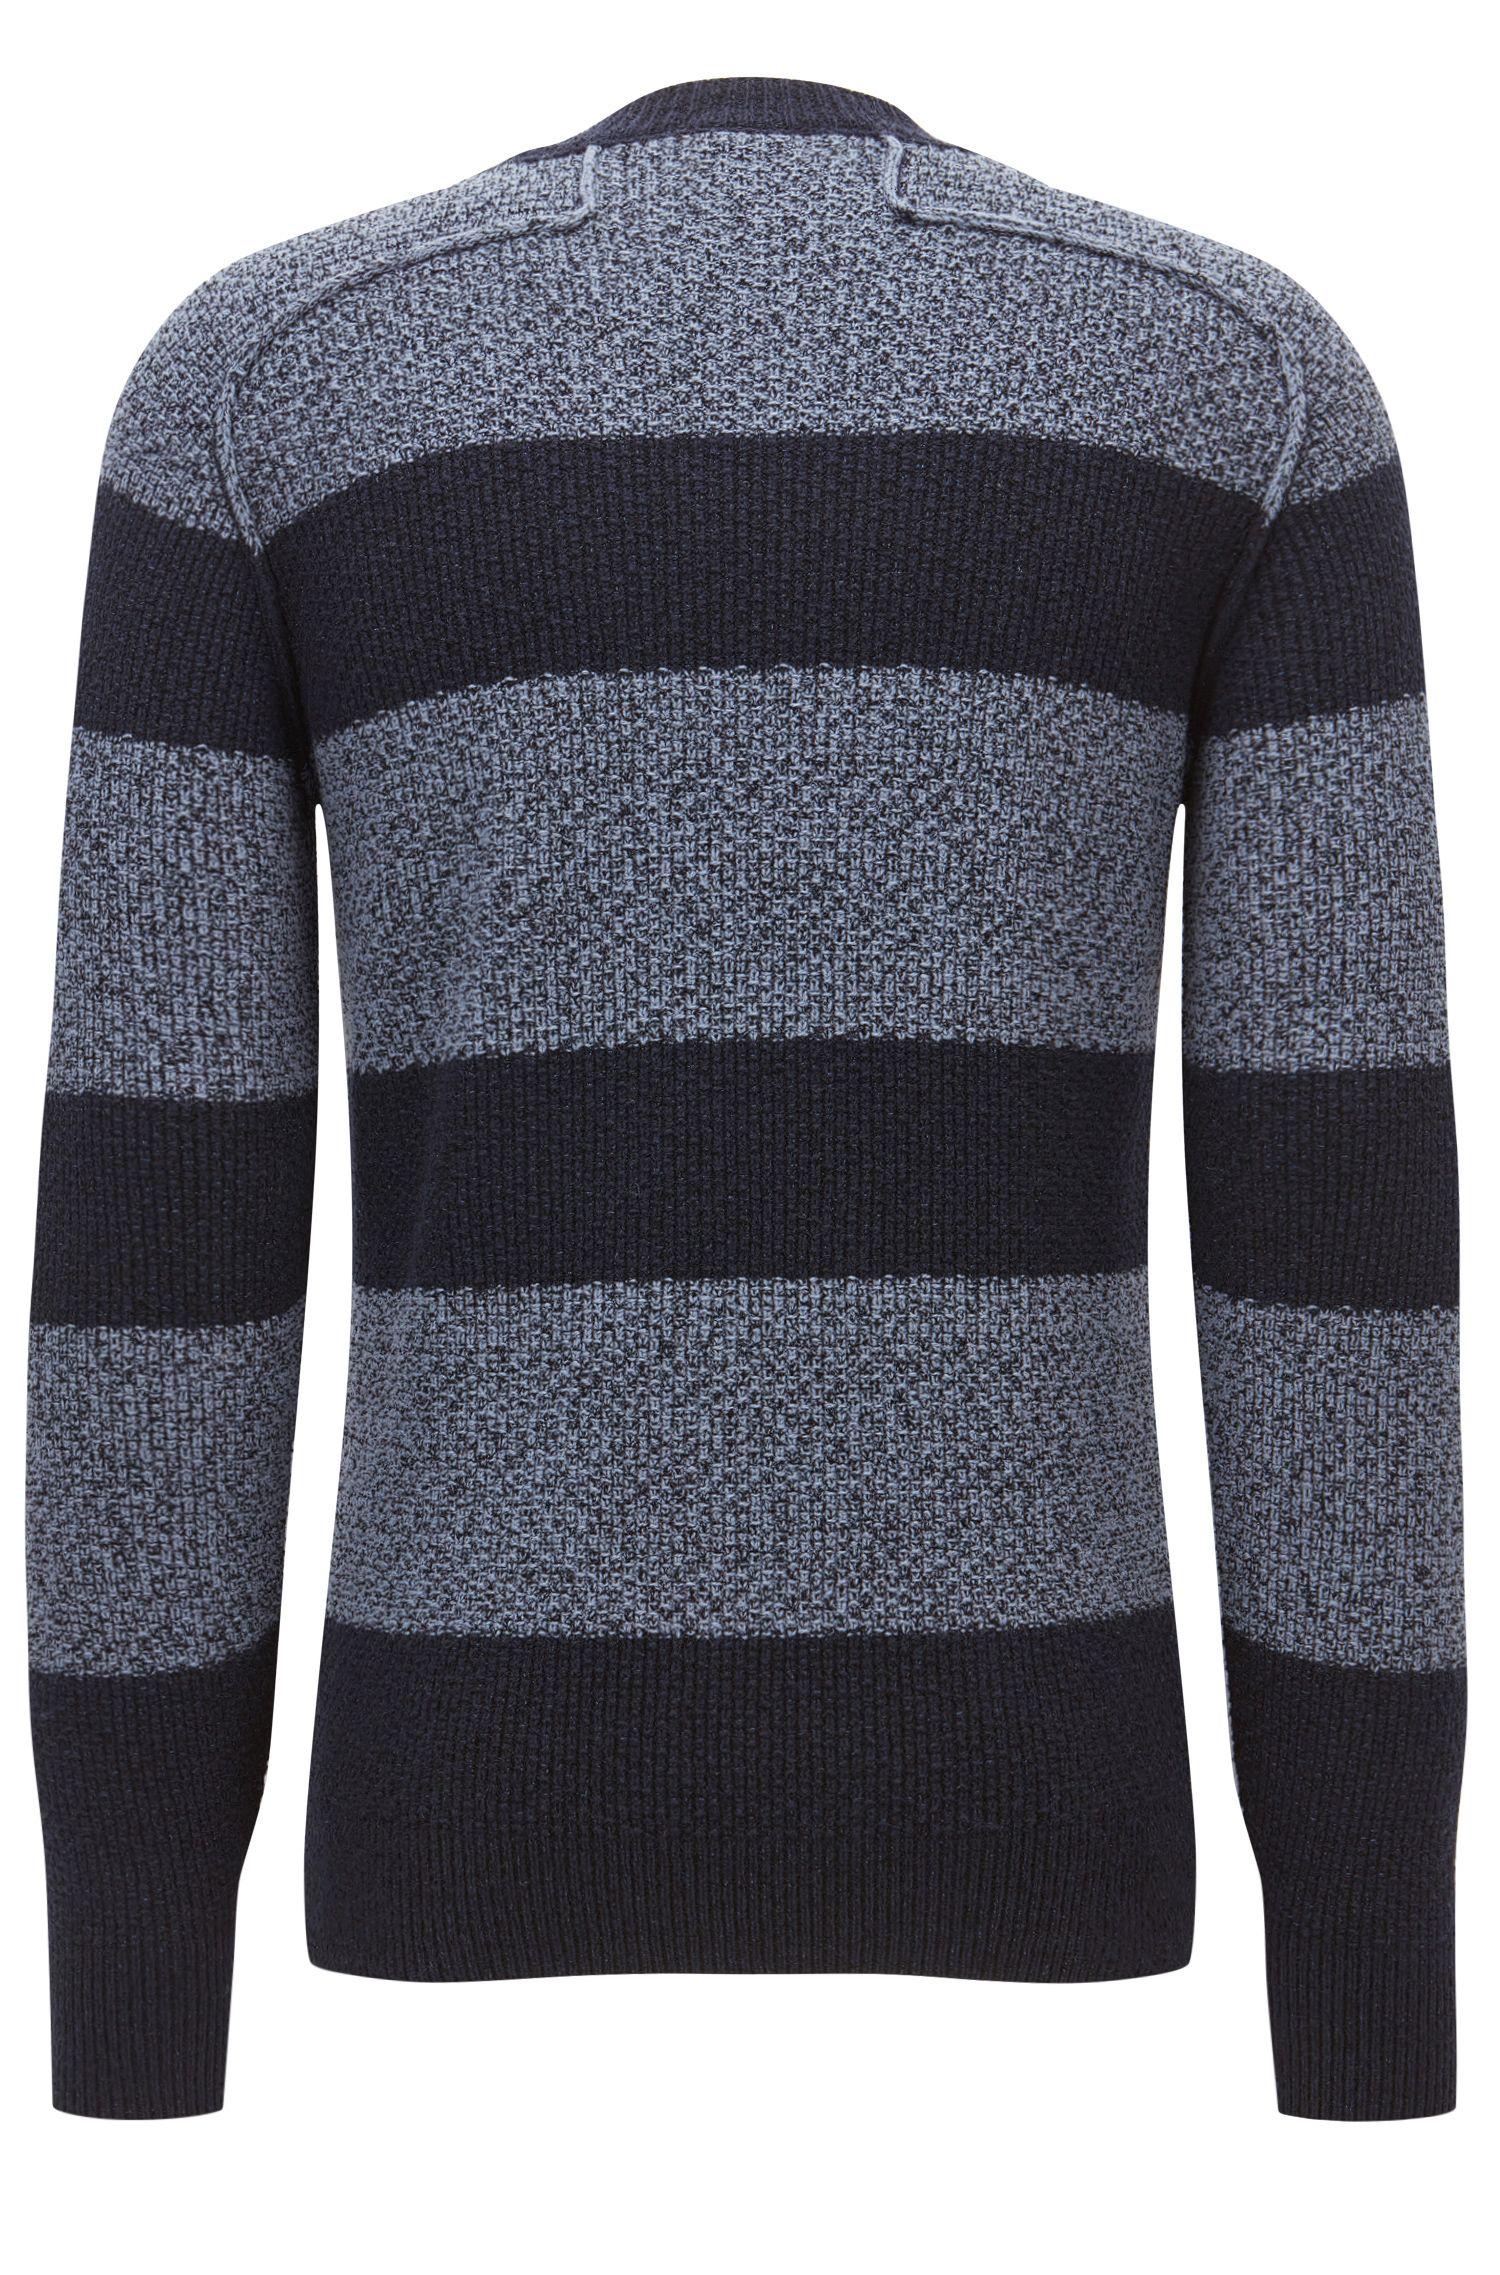 'Arbieri'   Striped Cotton-Wool Blend Sweater